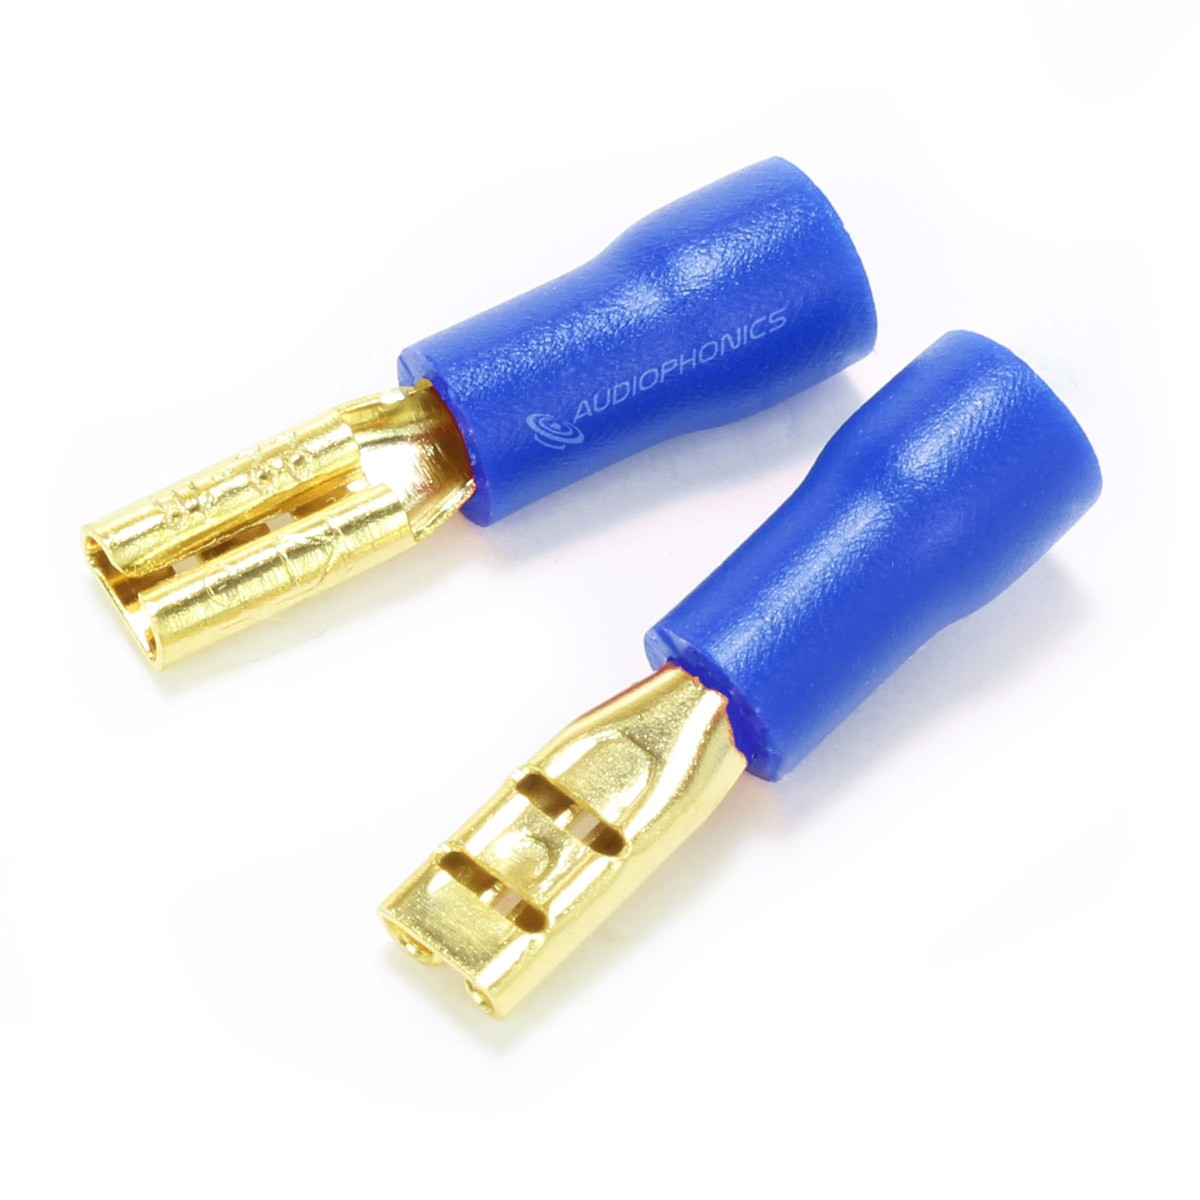 MUNDORF 2.8G Cosse Femelle 2.8mm Isolée Plaquée Or 1,5-2,5mm² Bleu (Set x10)